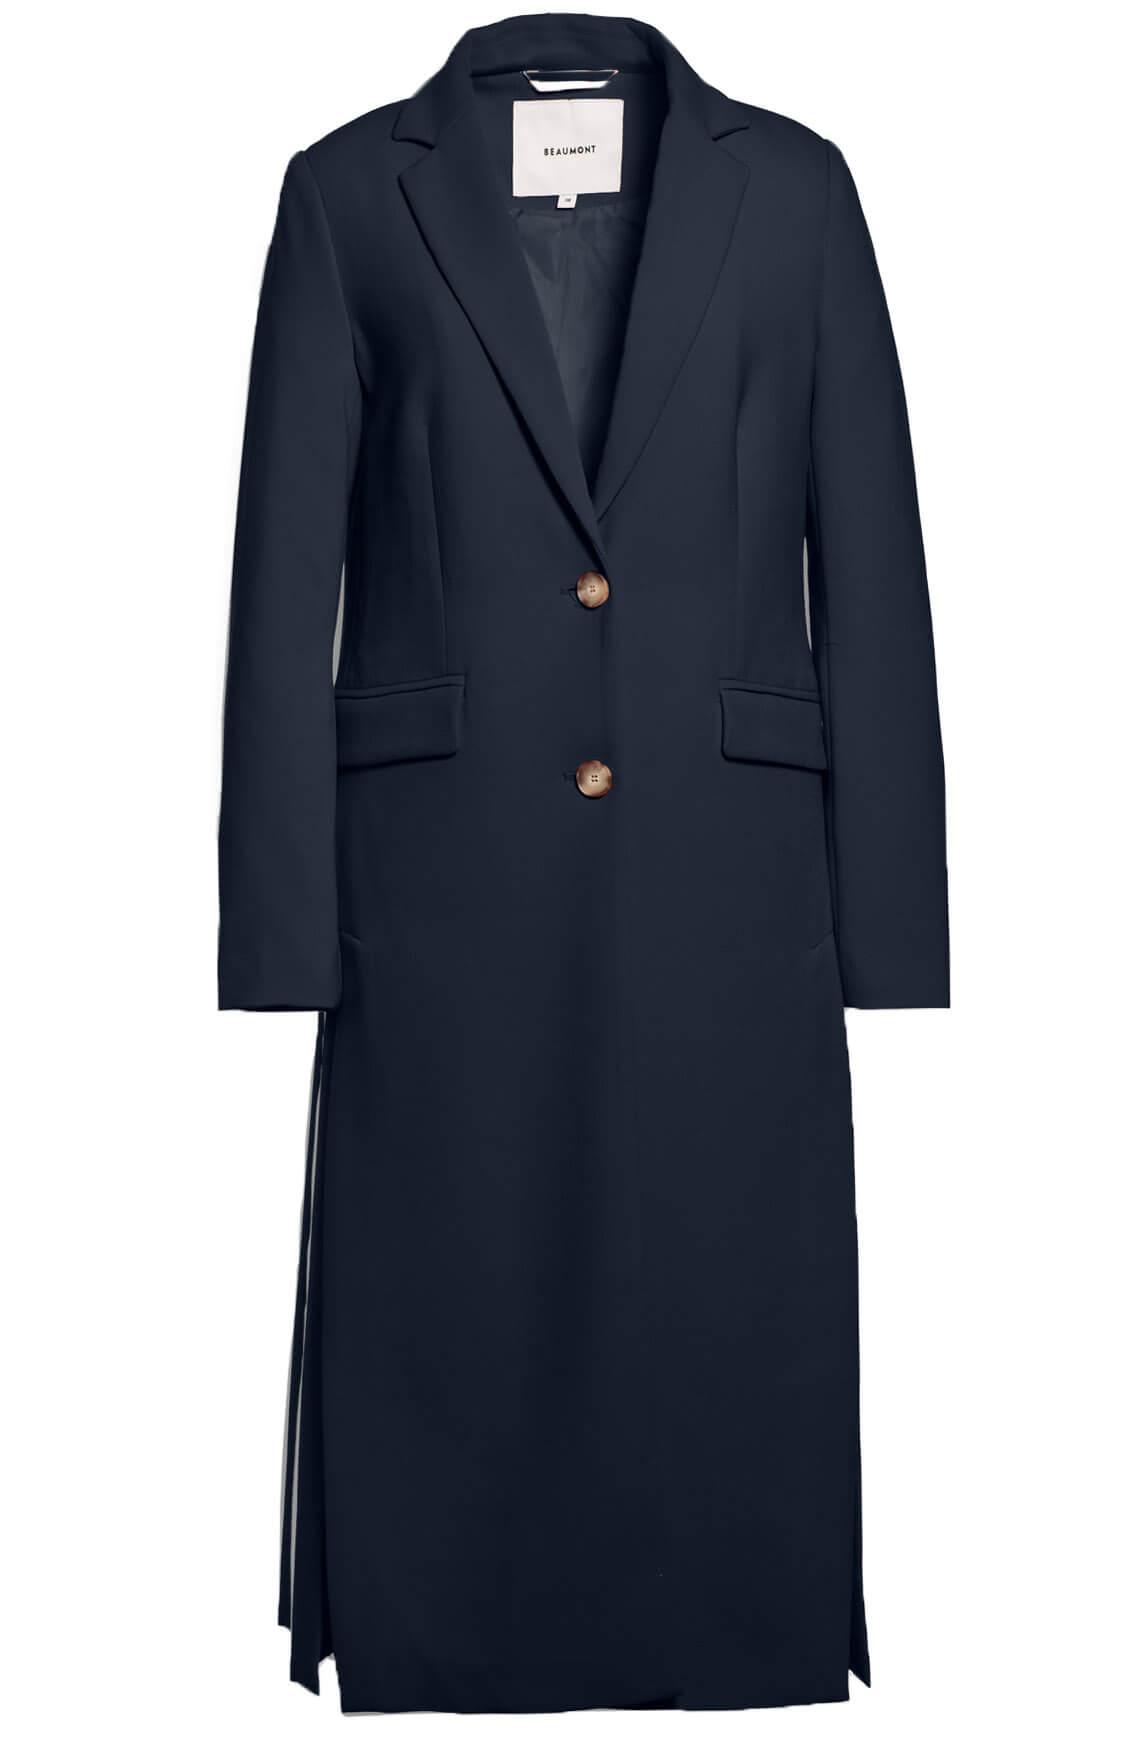 Beaumont Dames Lange jas Blauw